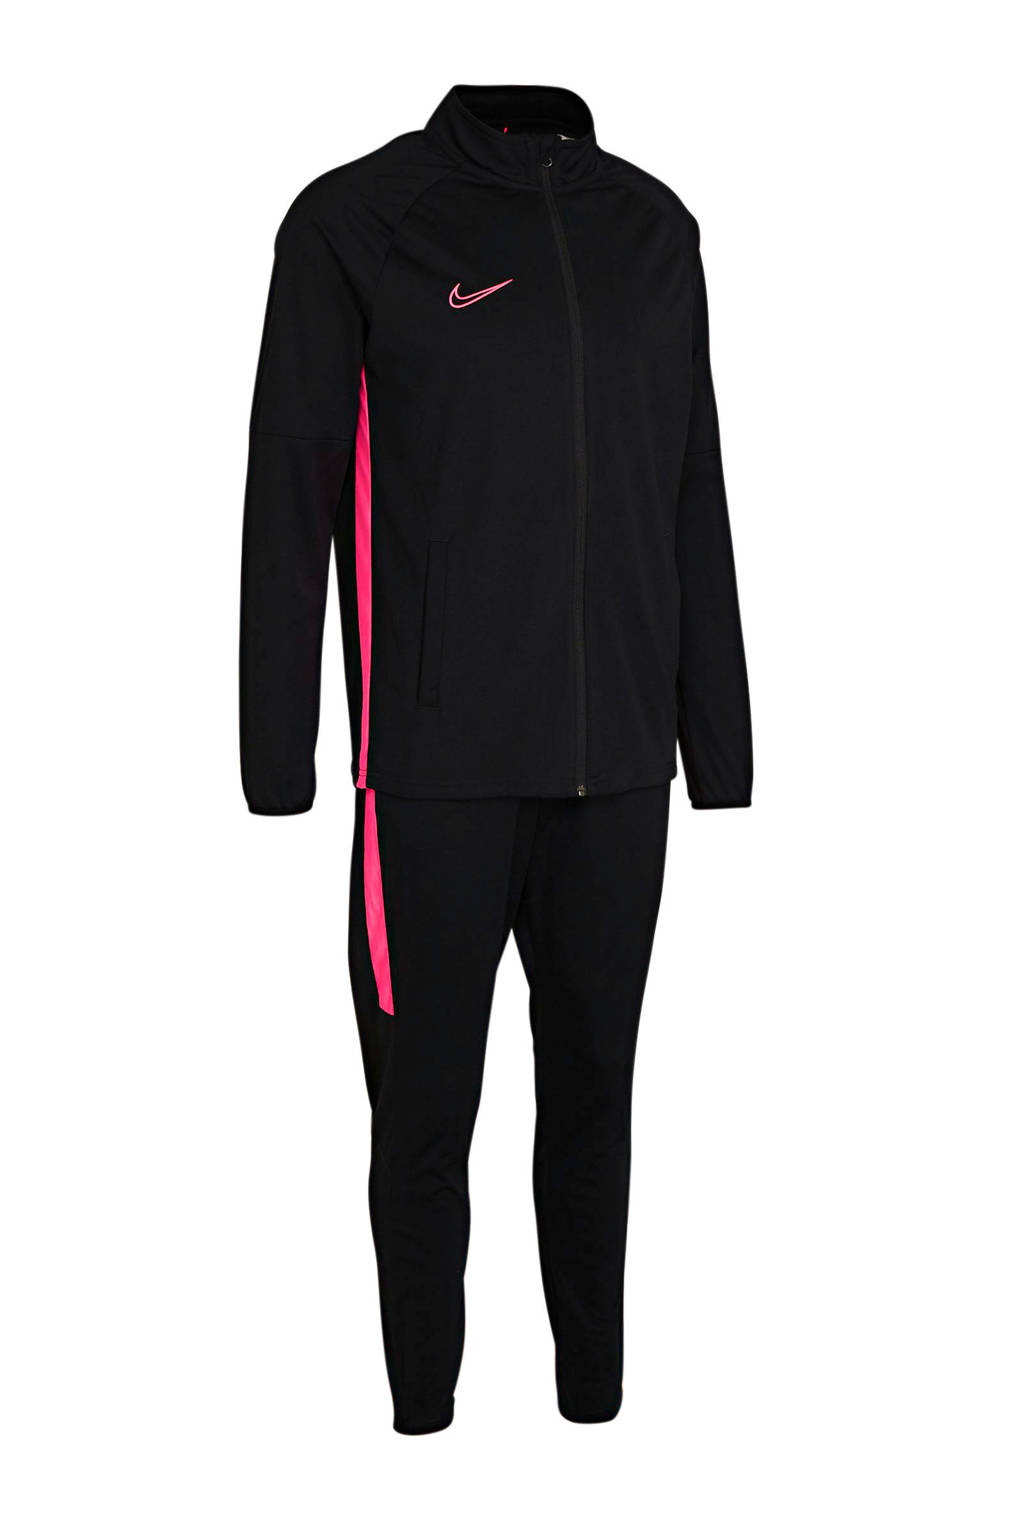 Nike Senior  trainingspak zwart/roze, Zwart/roze